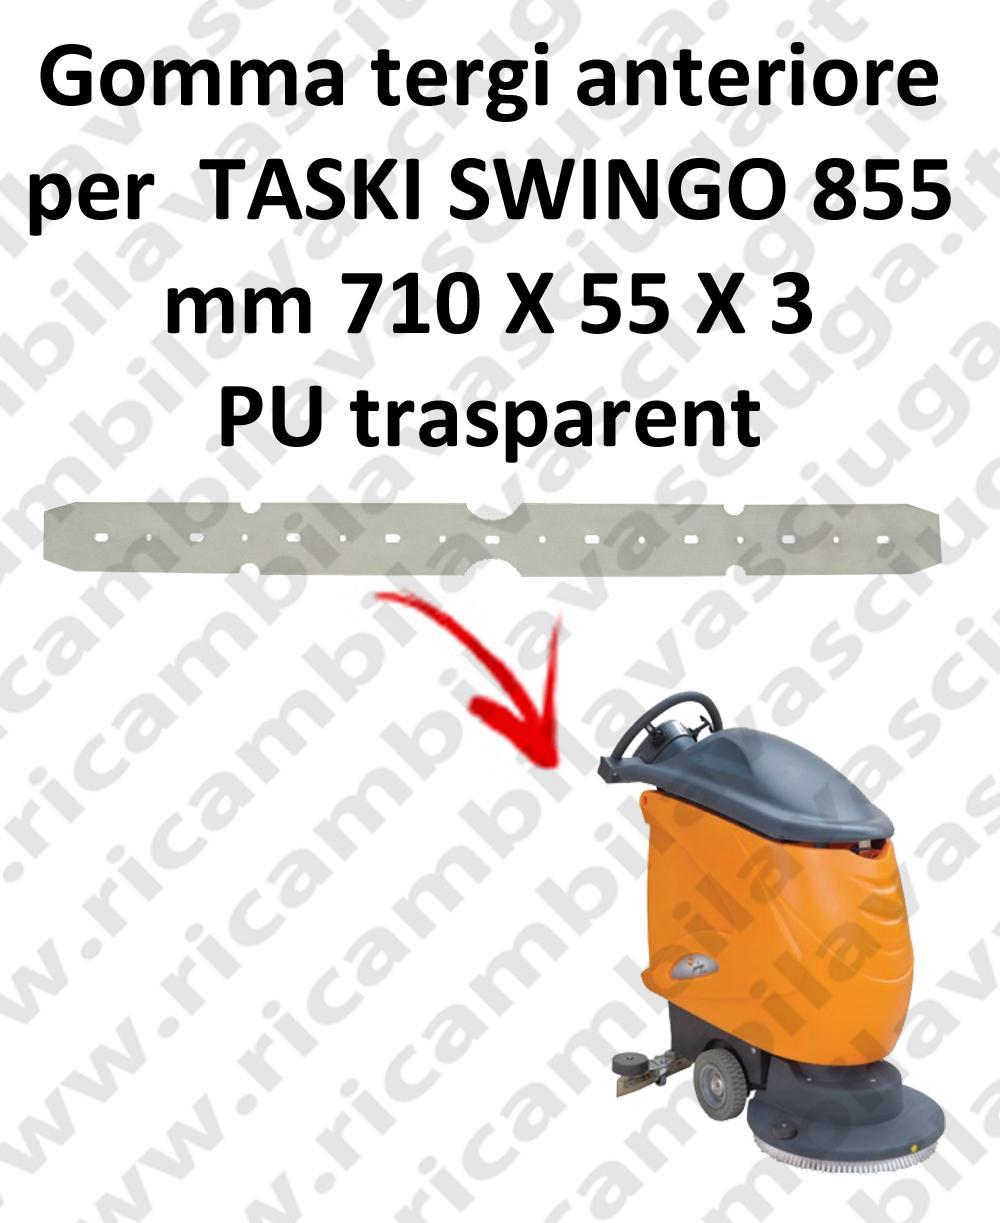 Gomma tergipavimento anteriore per lavapavimenti TASKI Swingo 855